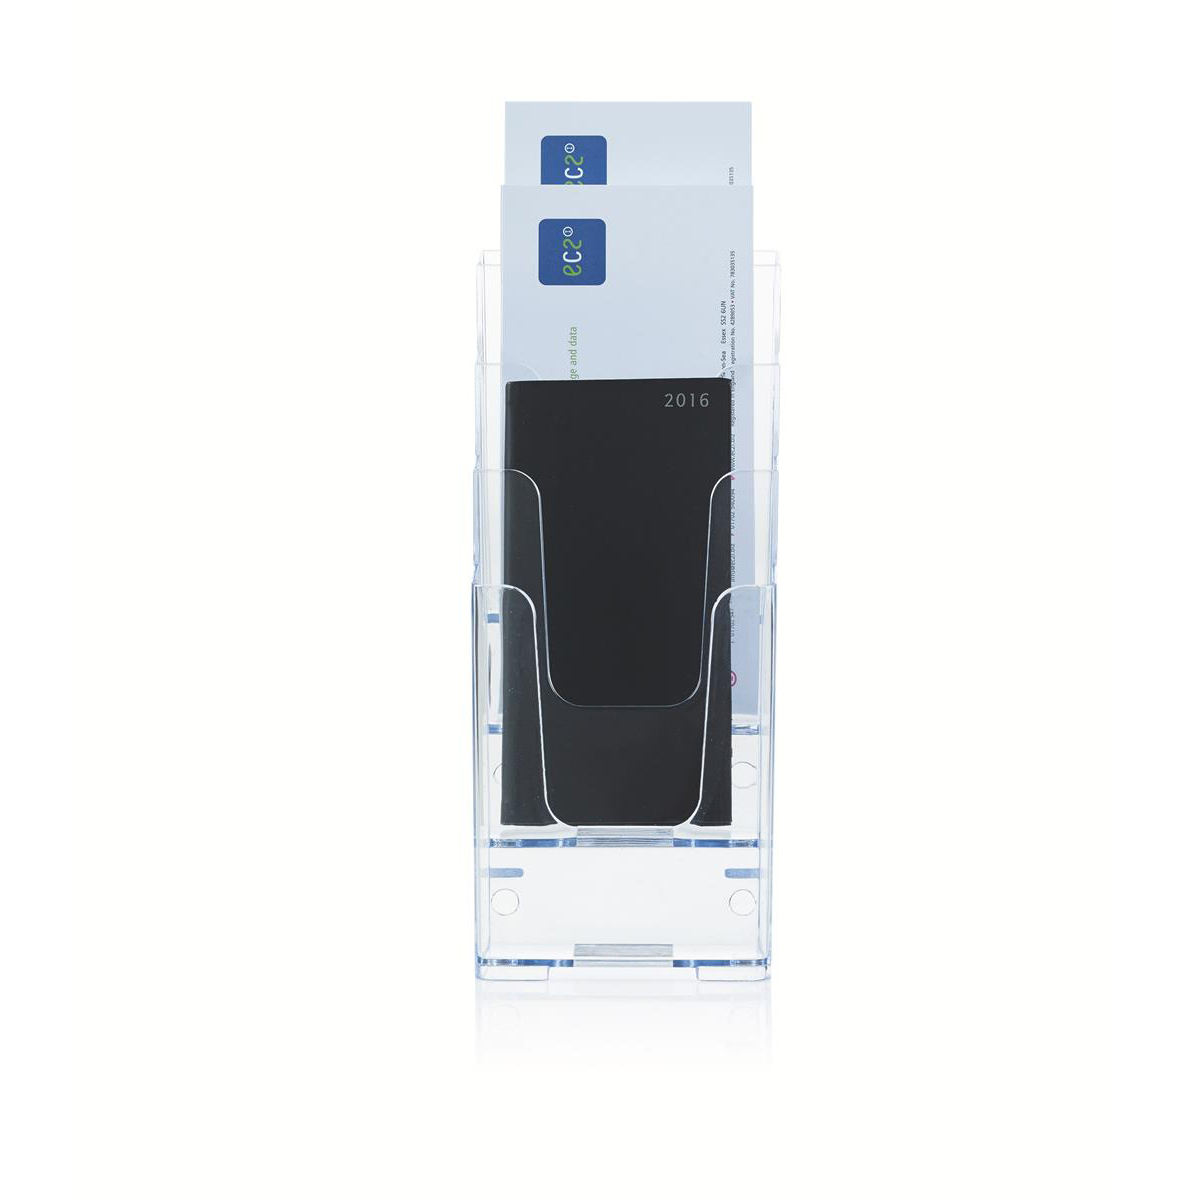 Literature Display Holder Multi Tier for Wall or Desktop 4 x 1/3xA4 Pockets Clear